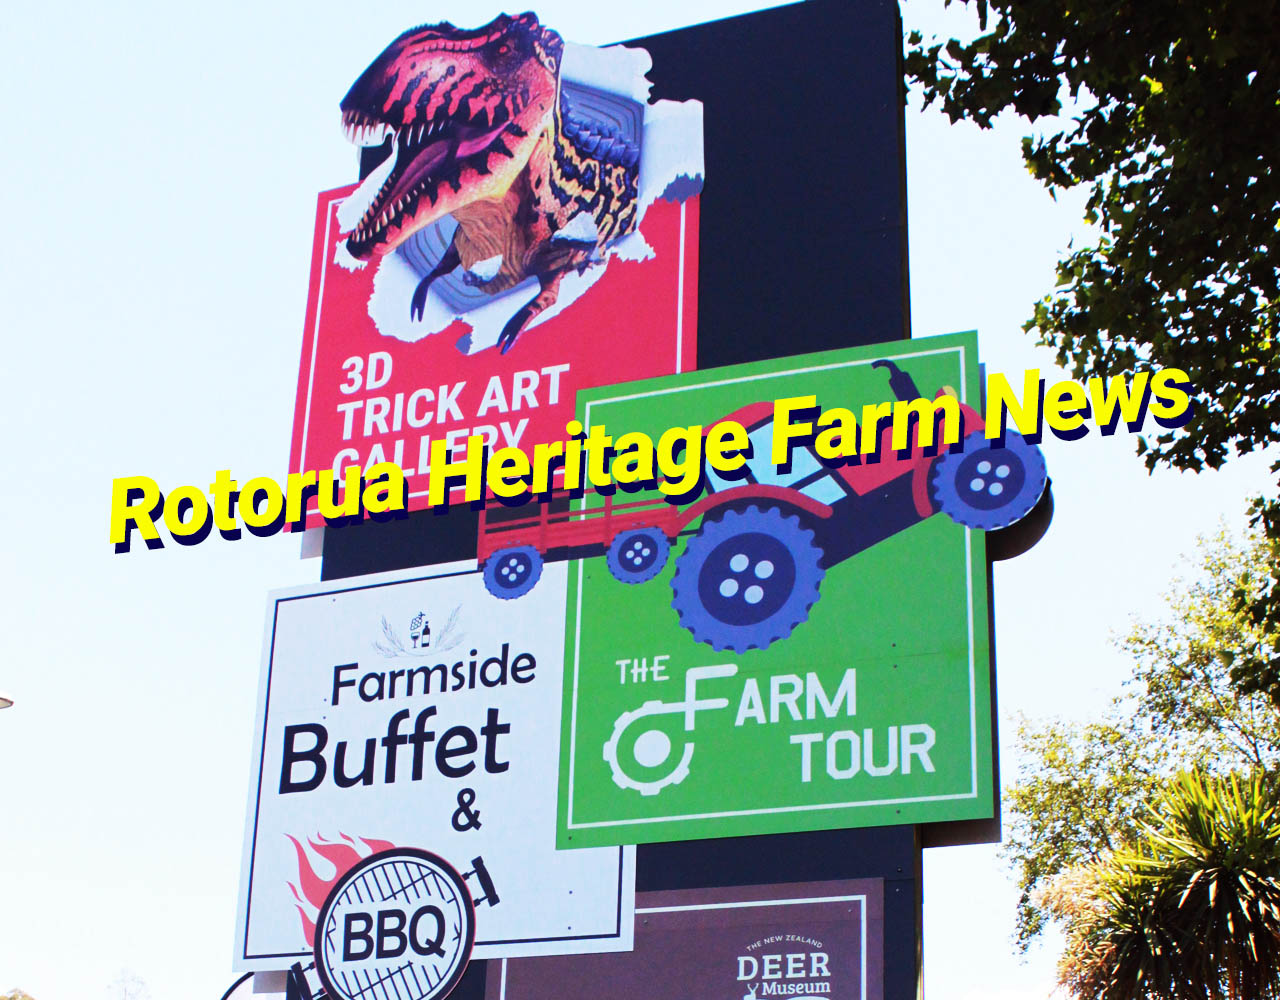 Rotorua Heritage Farm